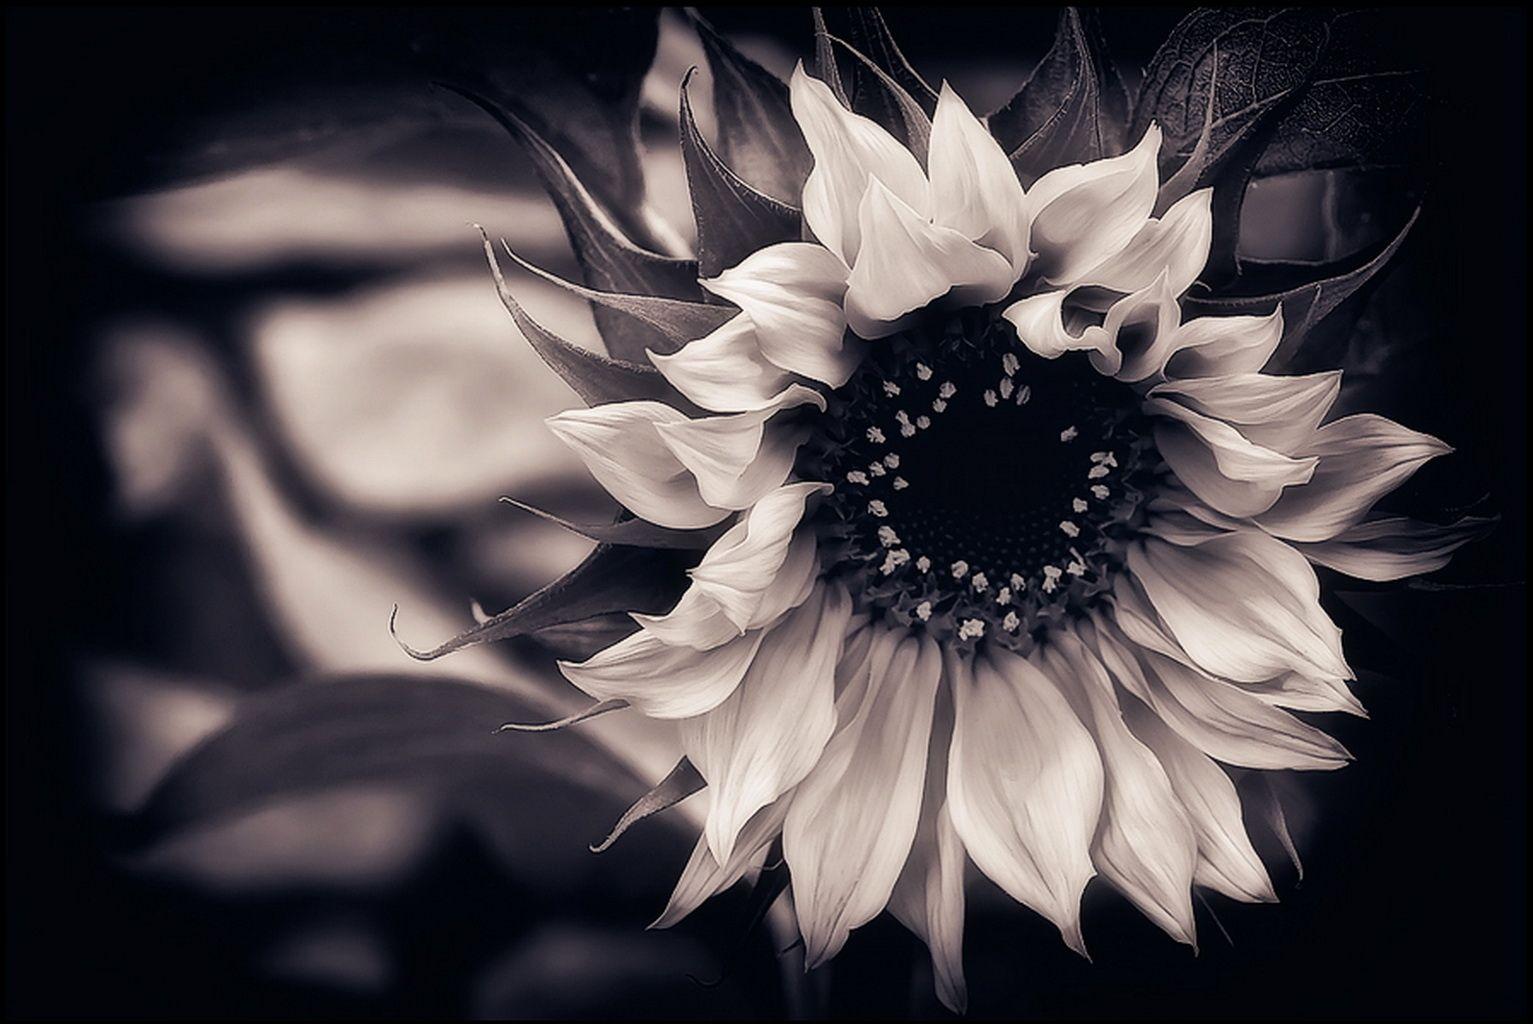 Black And White Sunflower